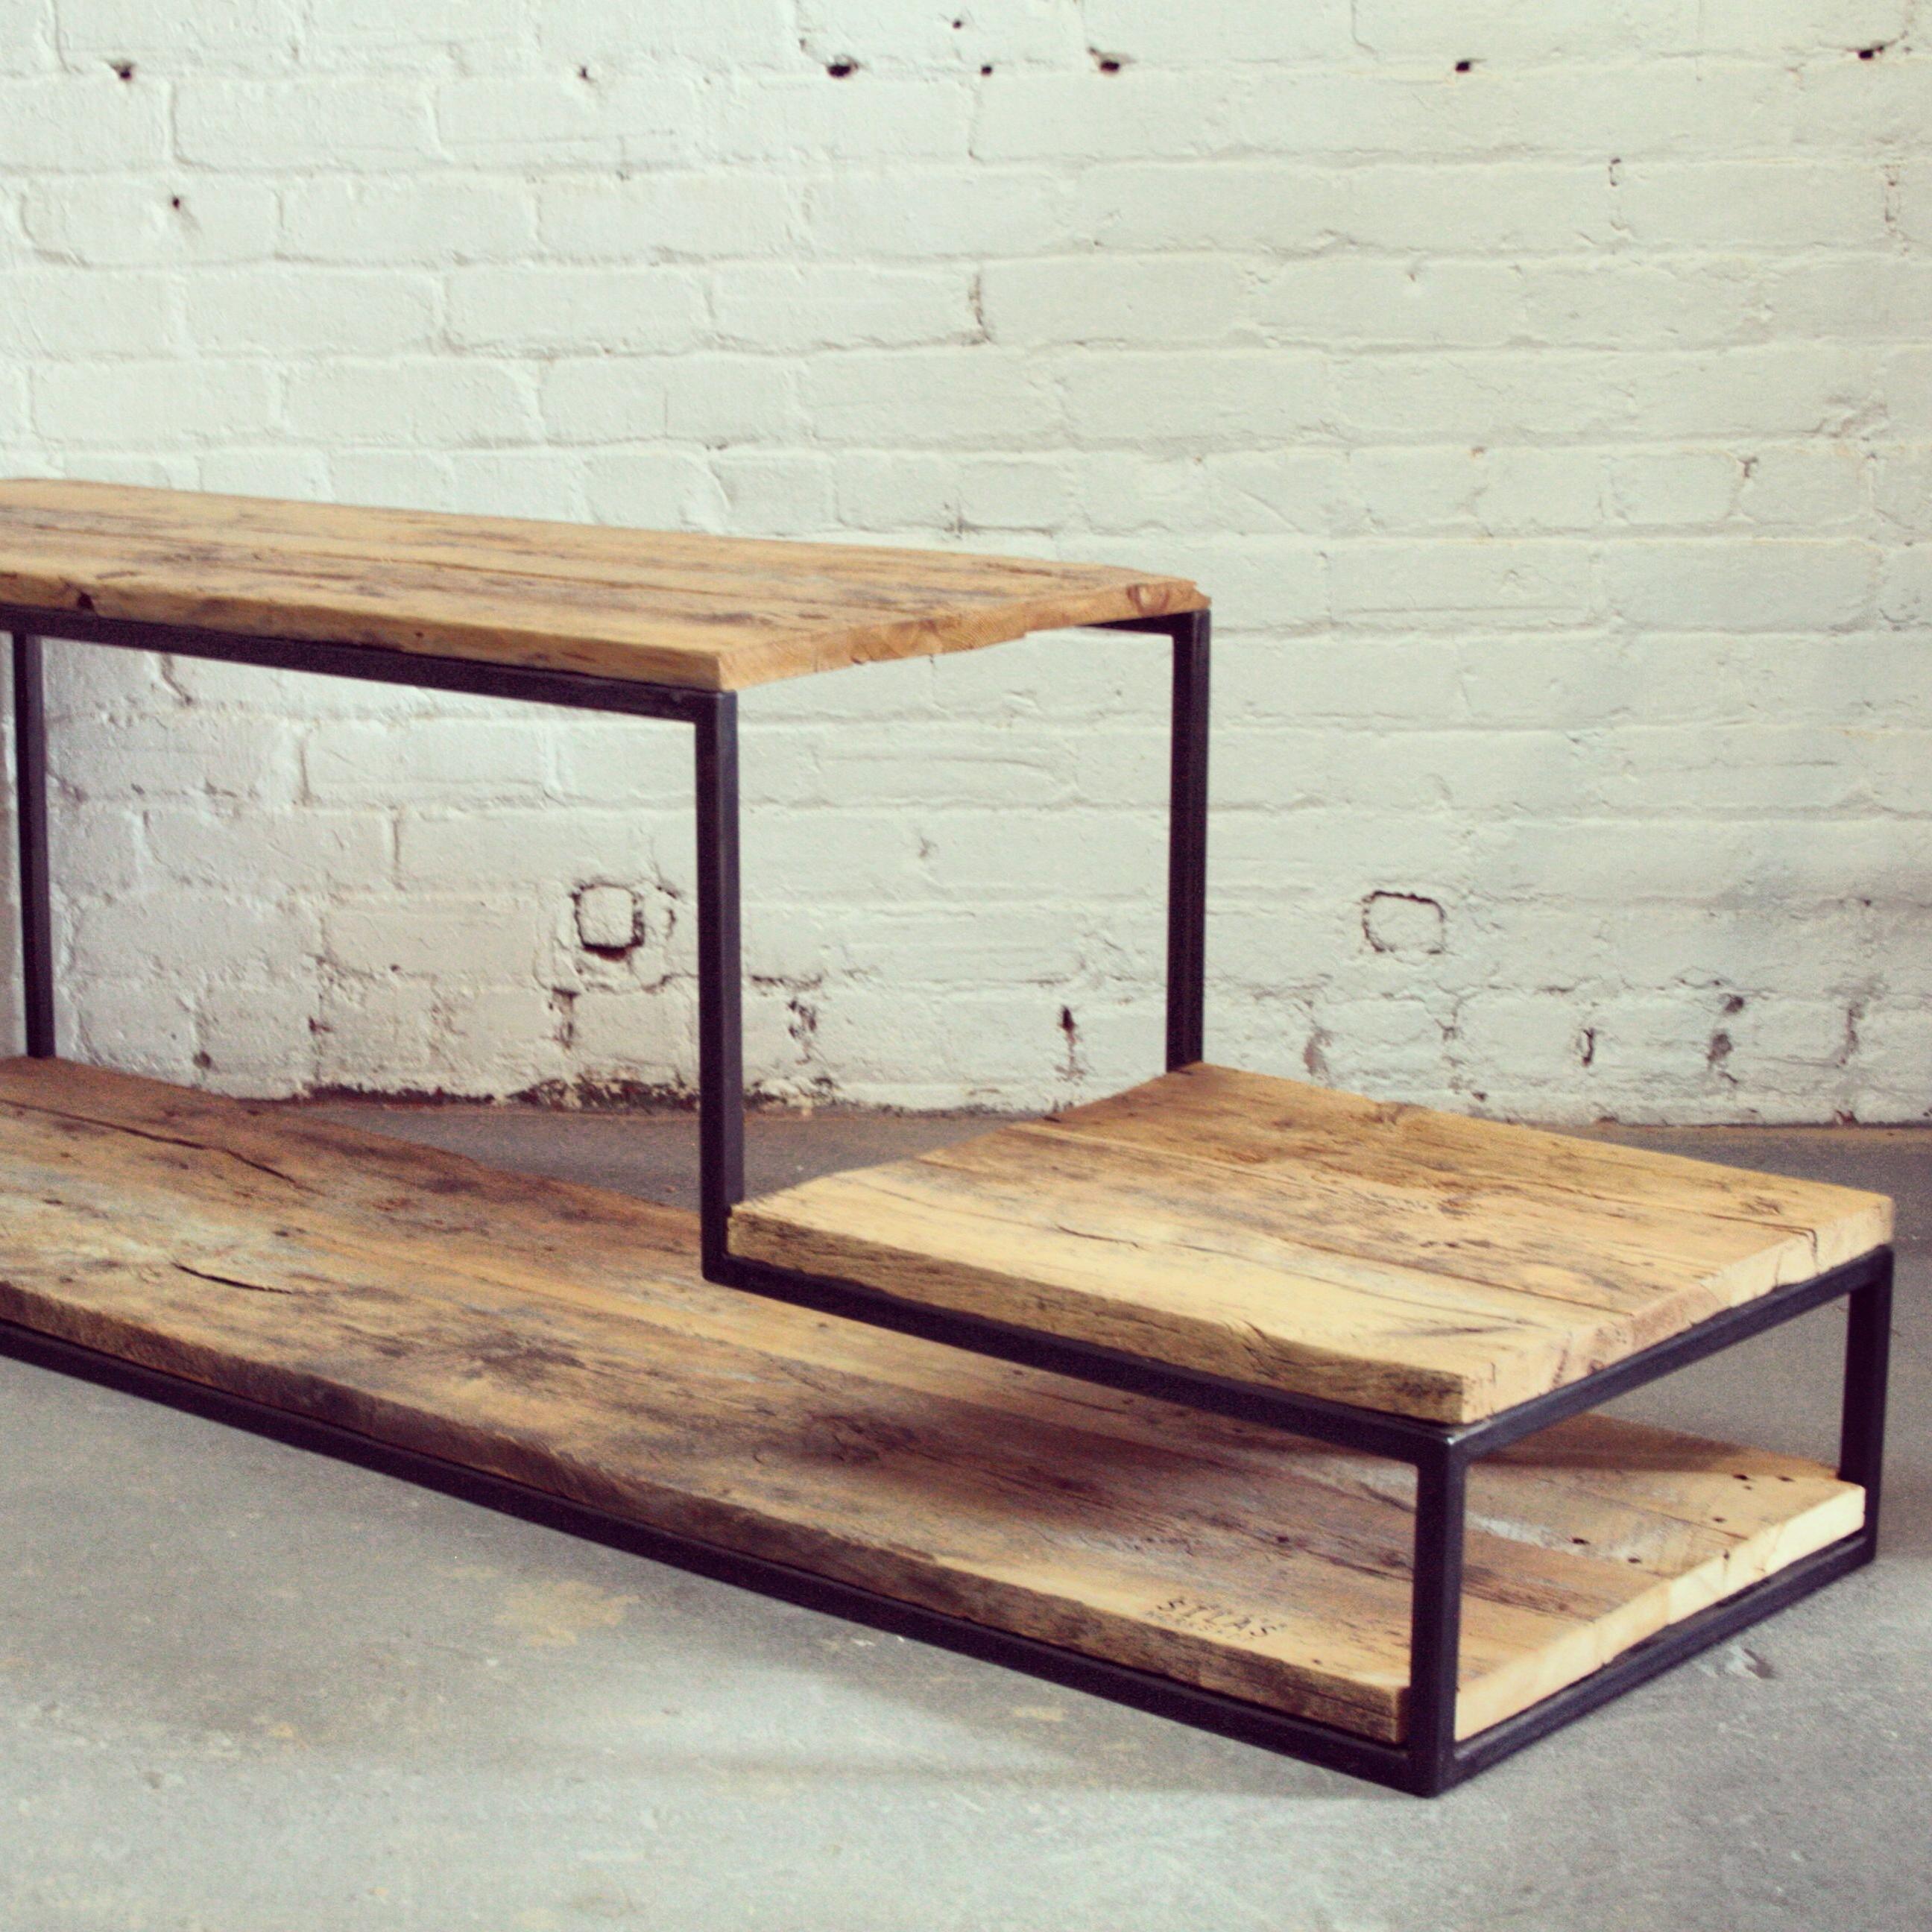 meuble salon 1 jpg 2592 2592 pi ces de r ve pinterest. Black Bedroom Furniture Sets. Home Design Ideas